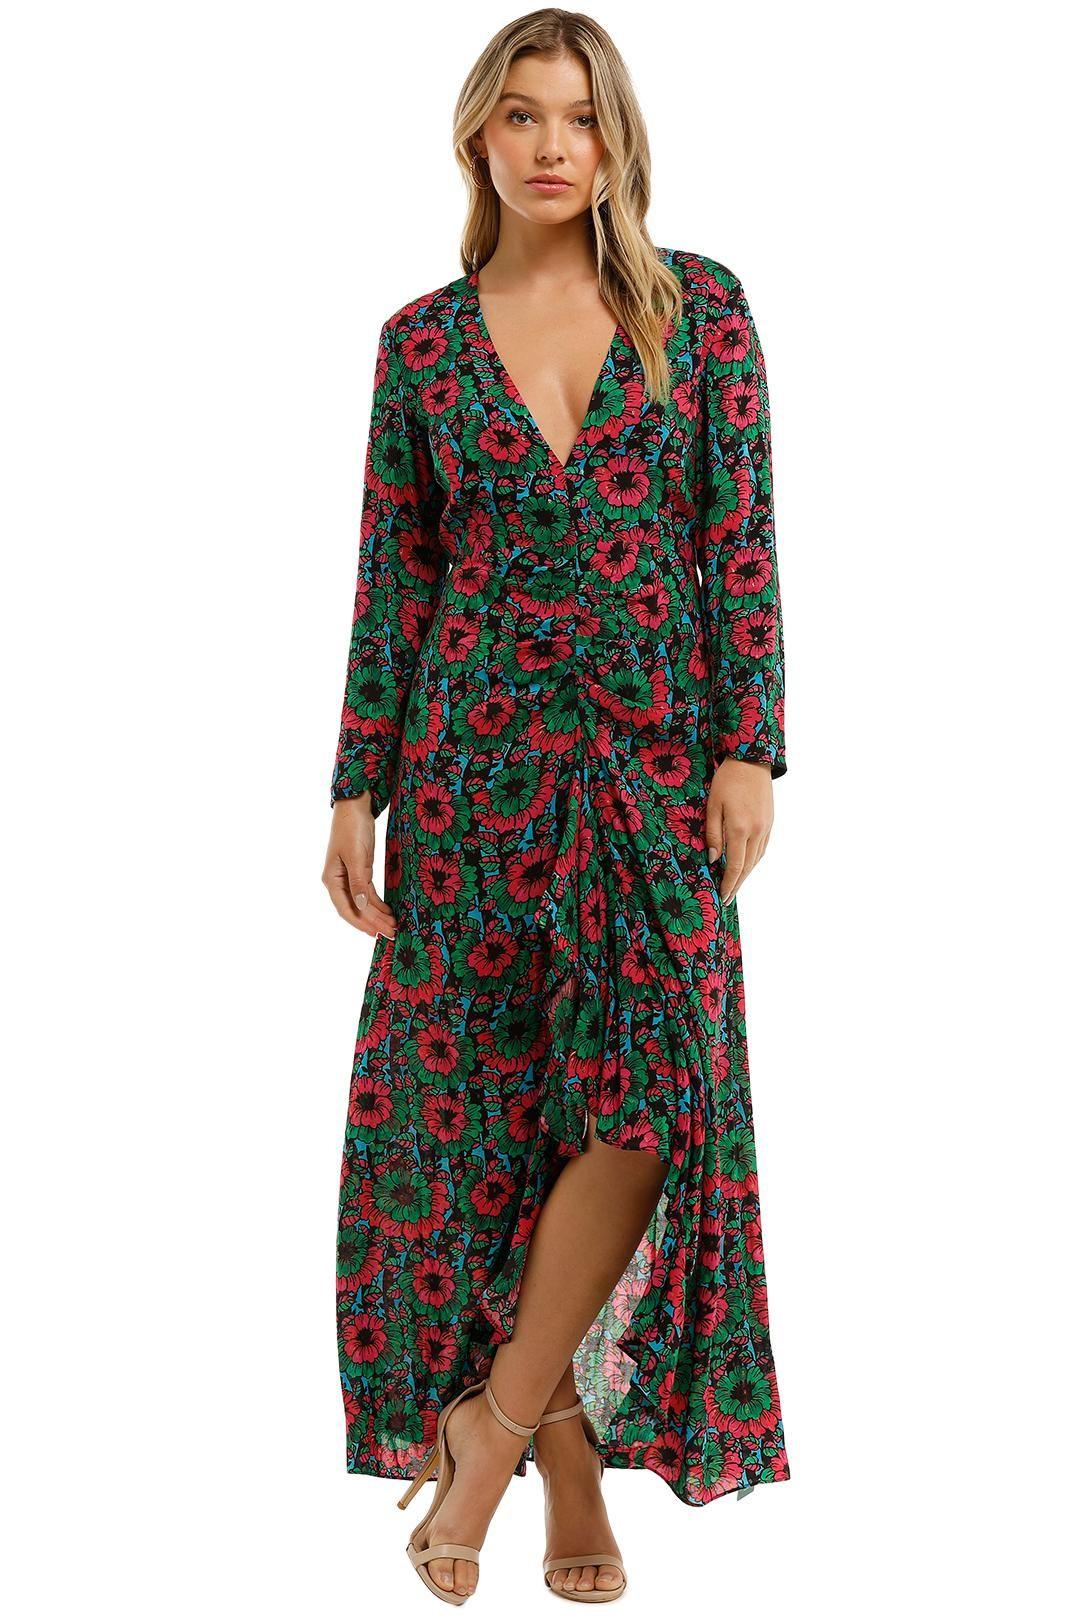 Rixo London Floral Print Cut Out Detail Dress Maxi